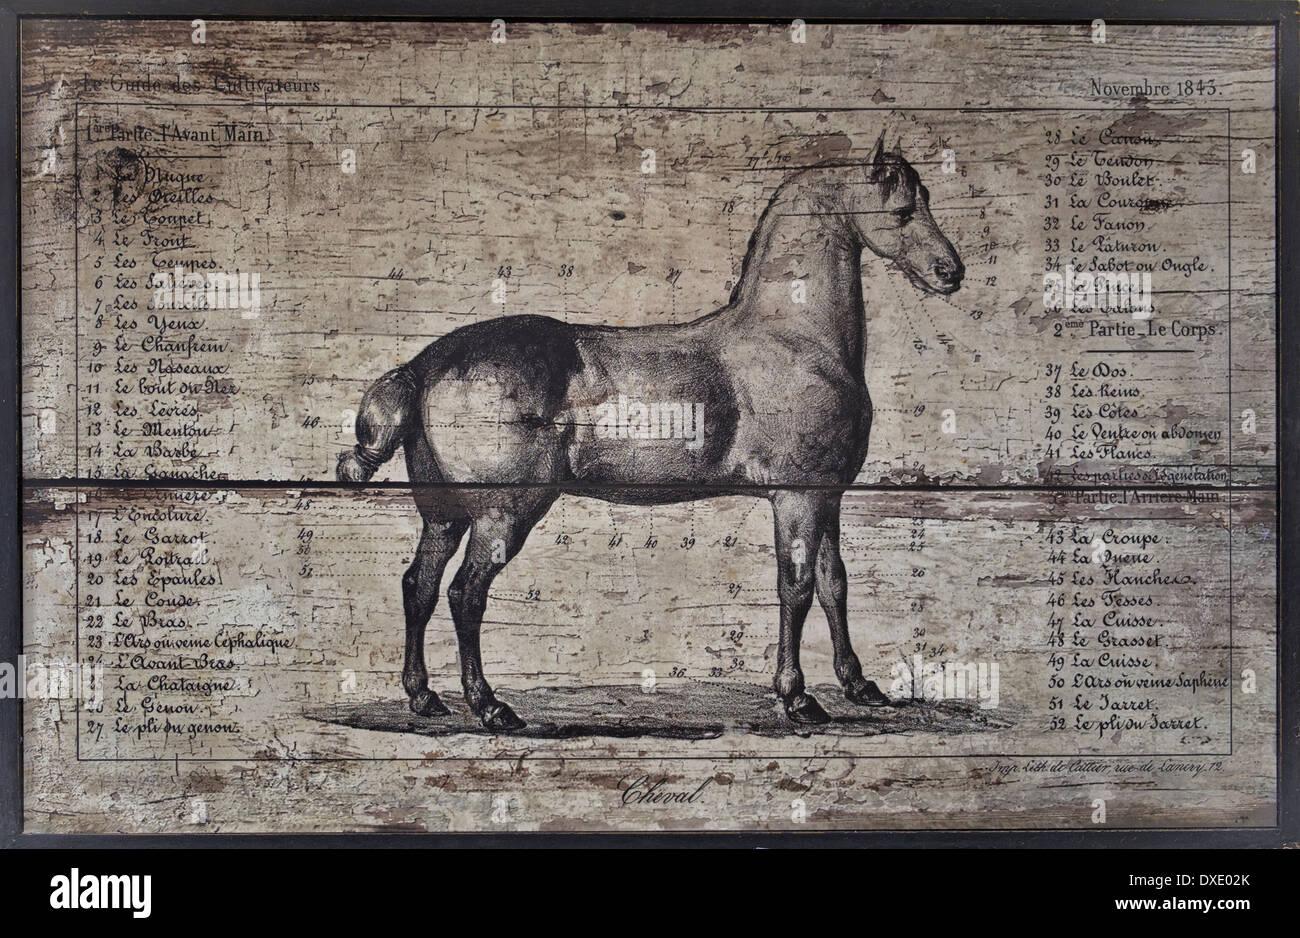 Anatomy Horse Animal Illustration Stockfotos & Anatomy Horse Animal ...